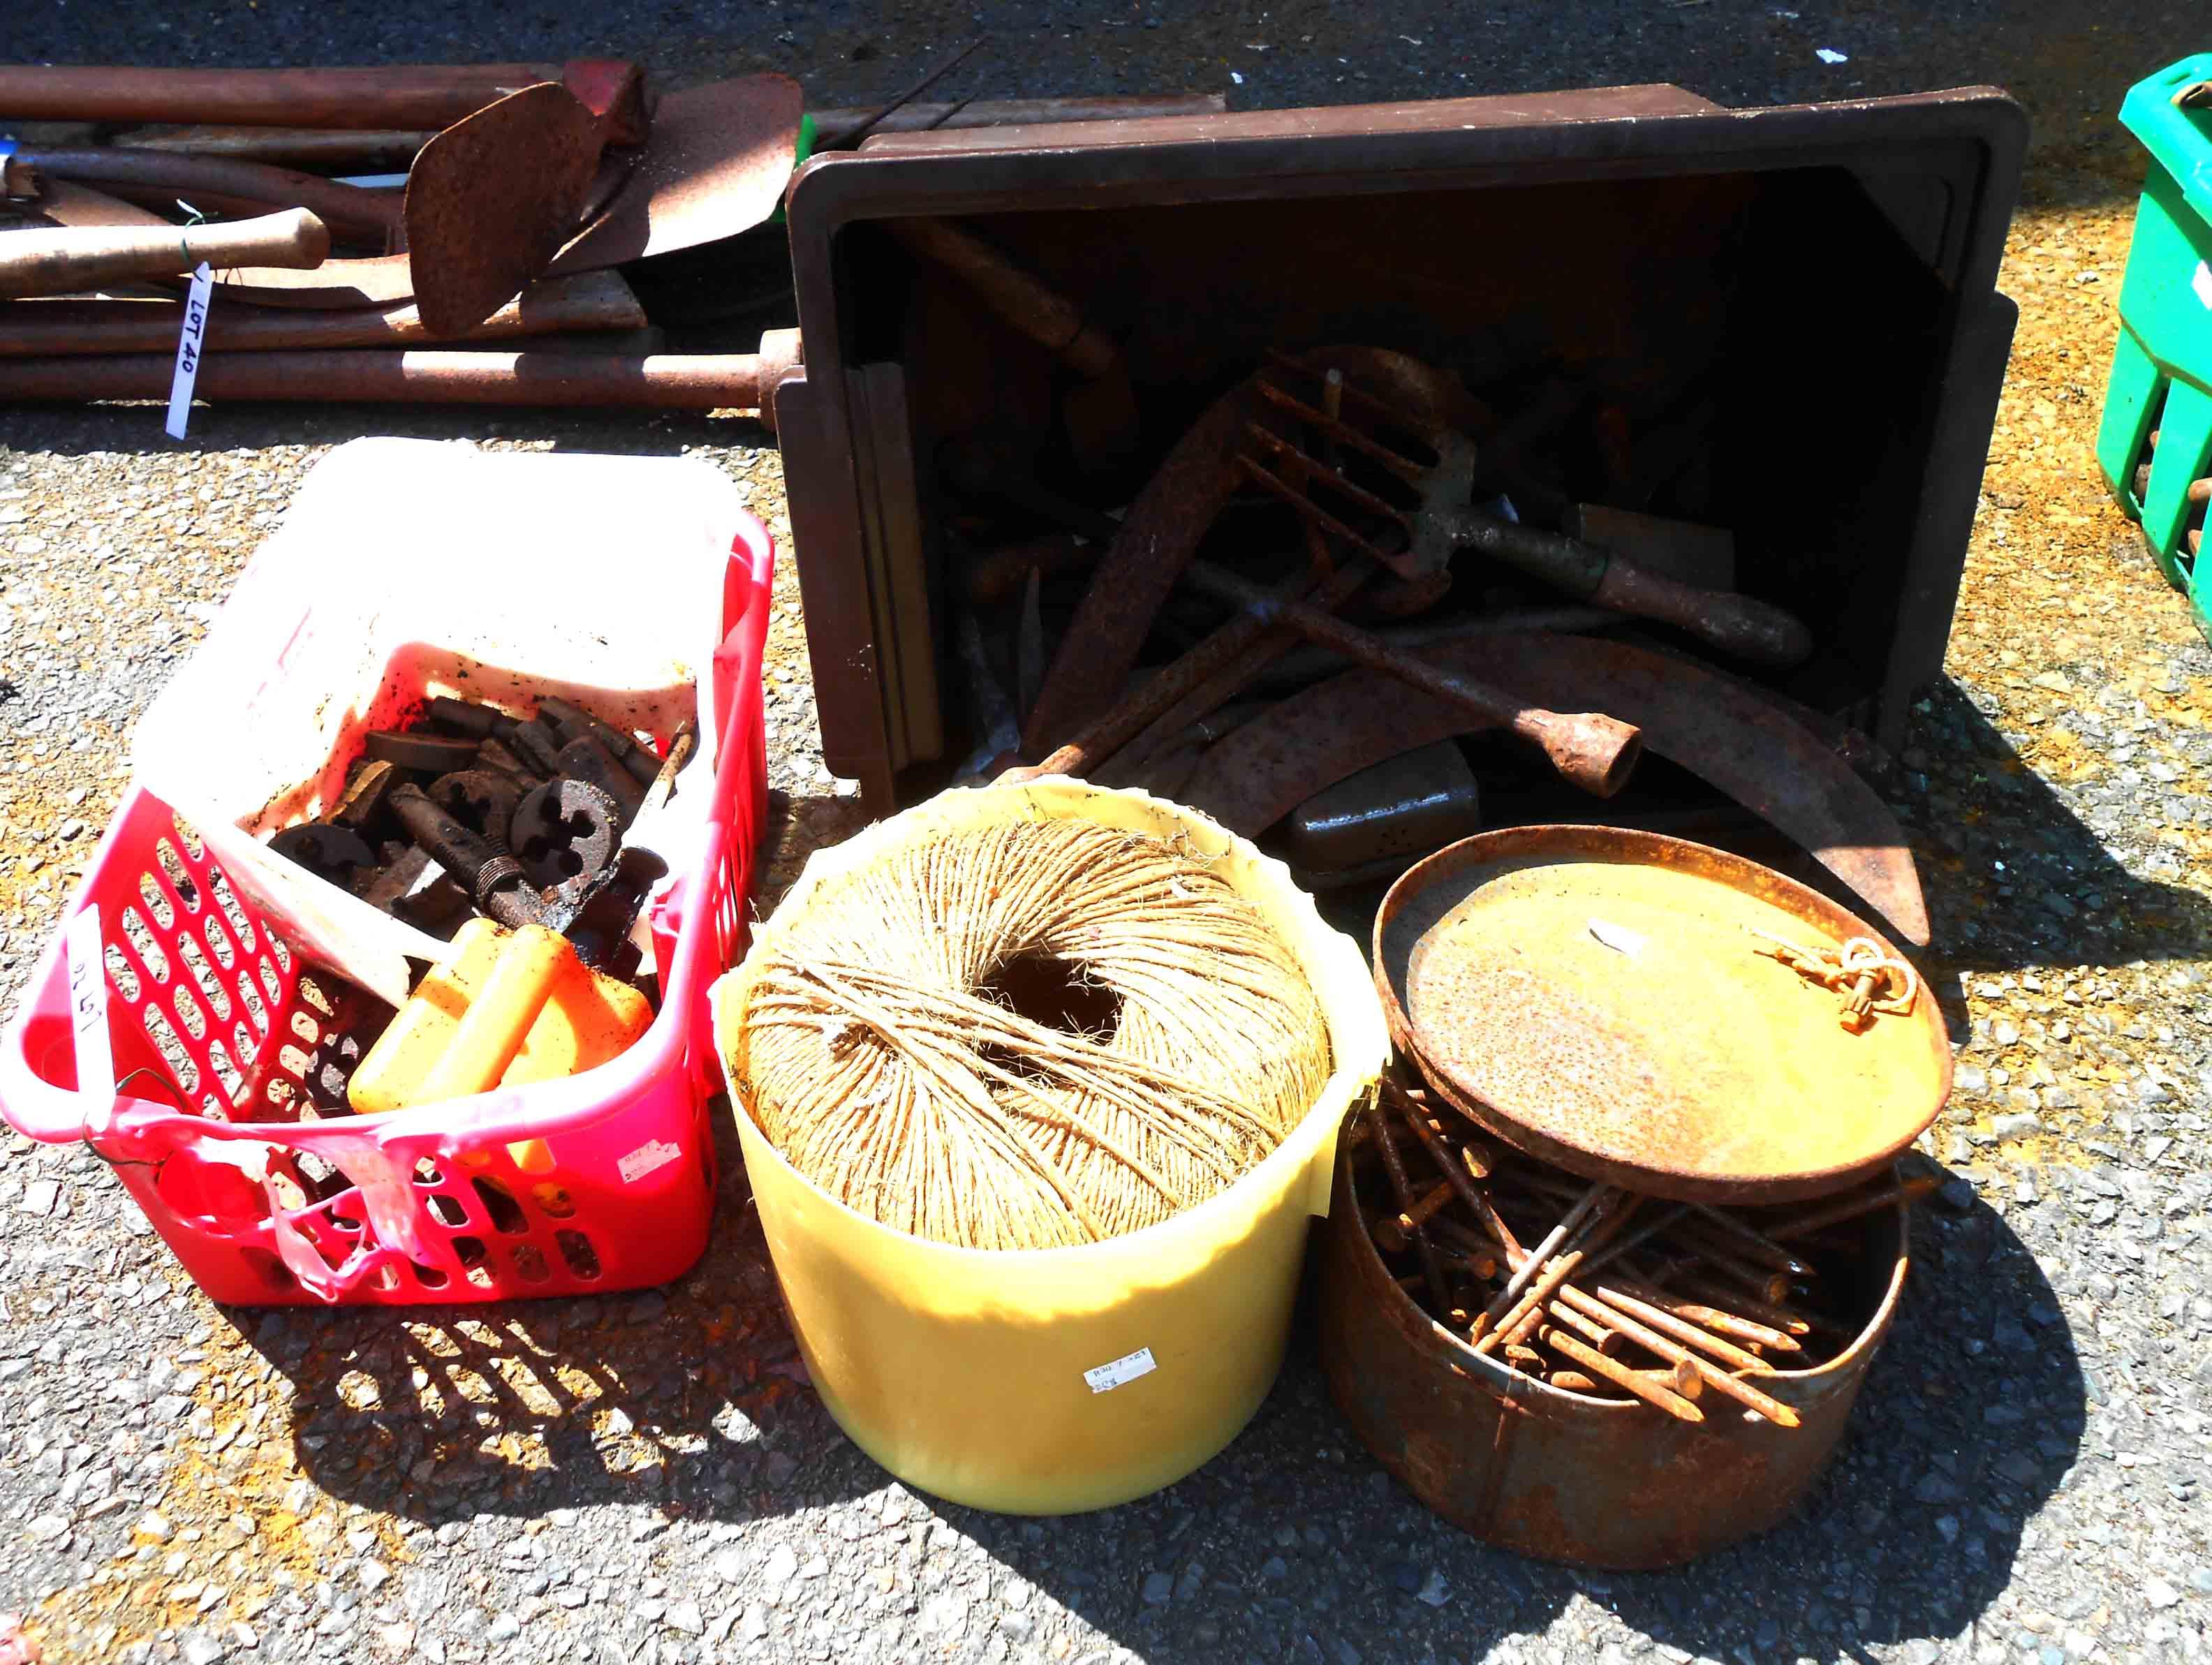 A quantity of old tools, etc.